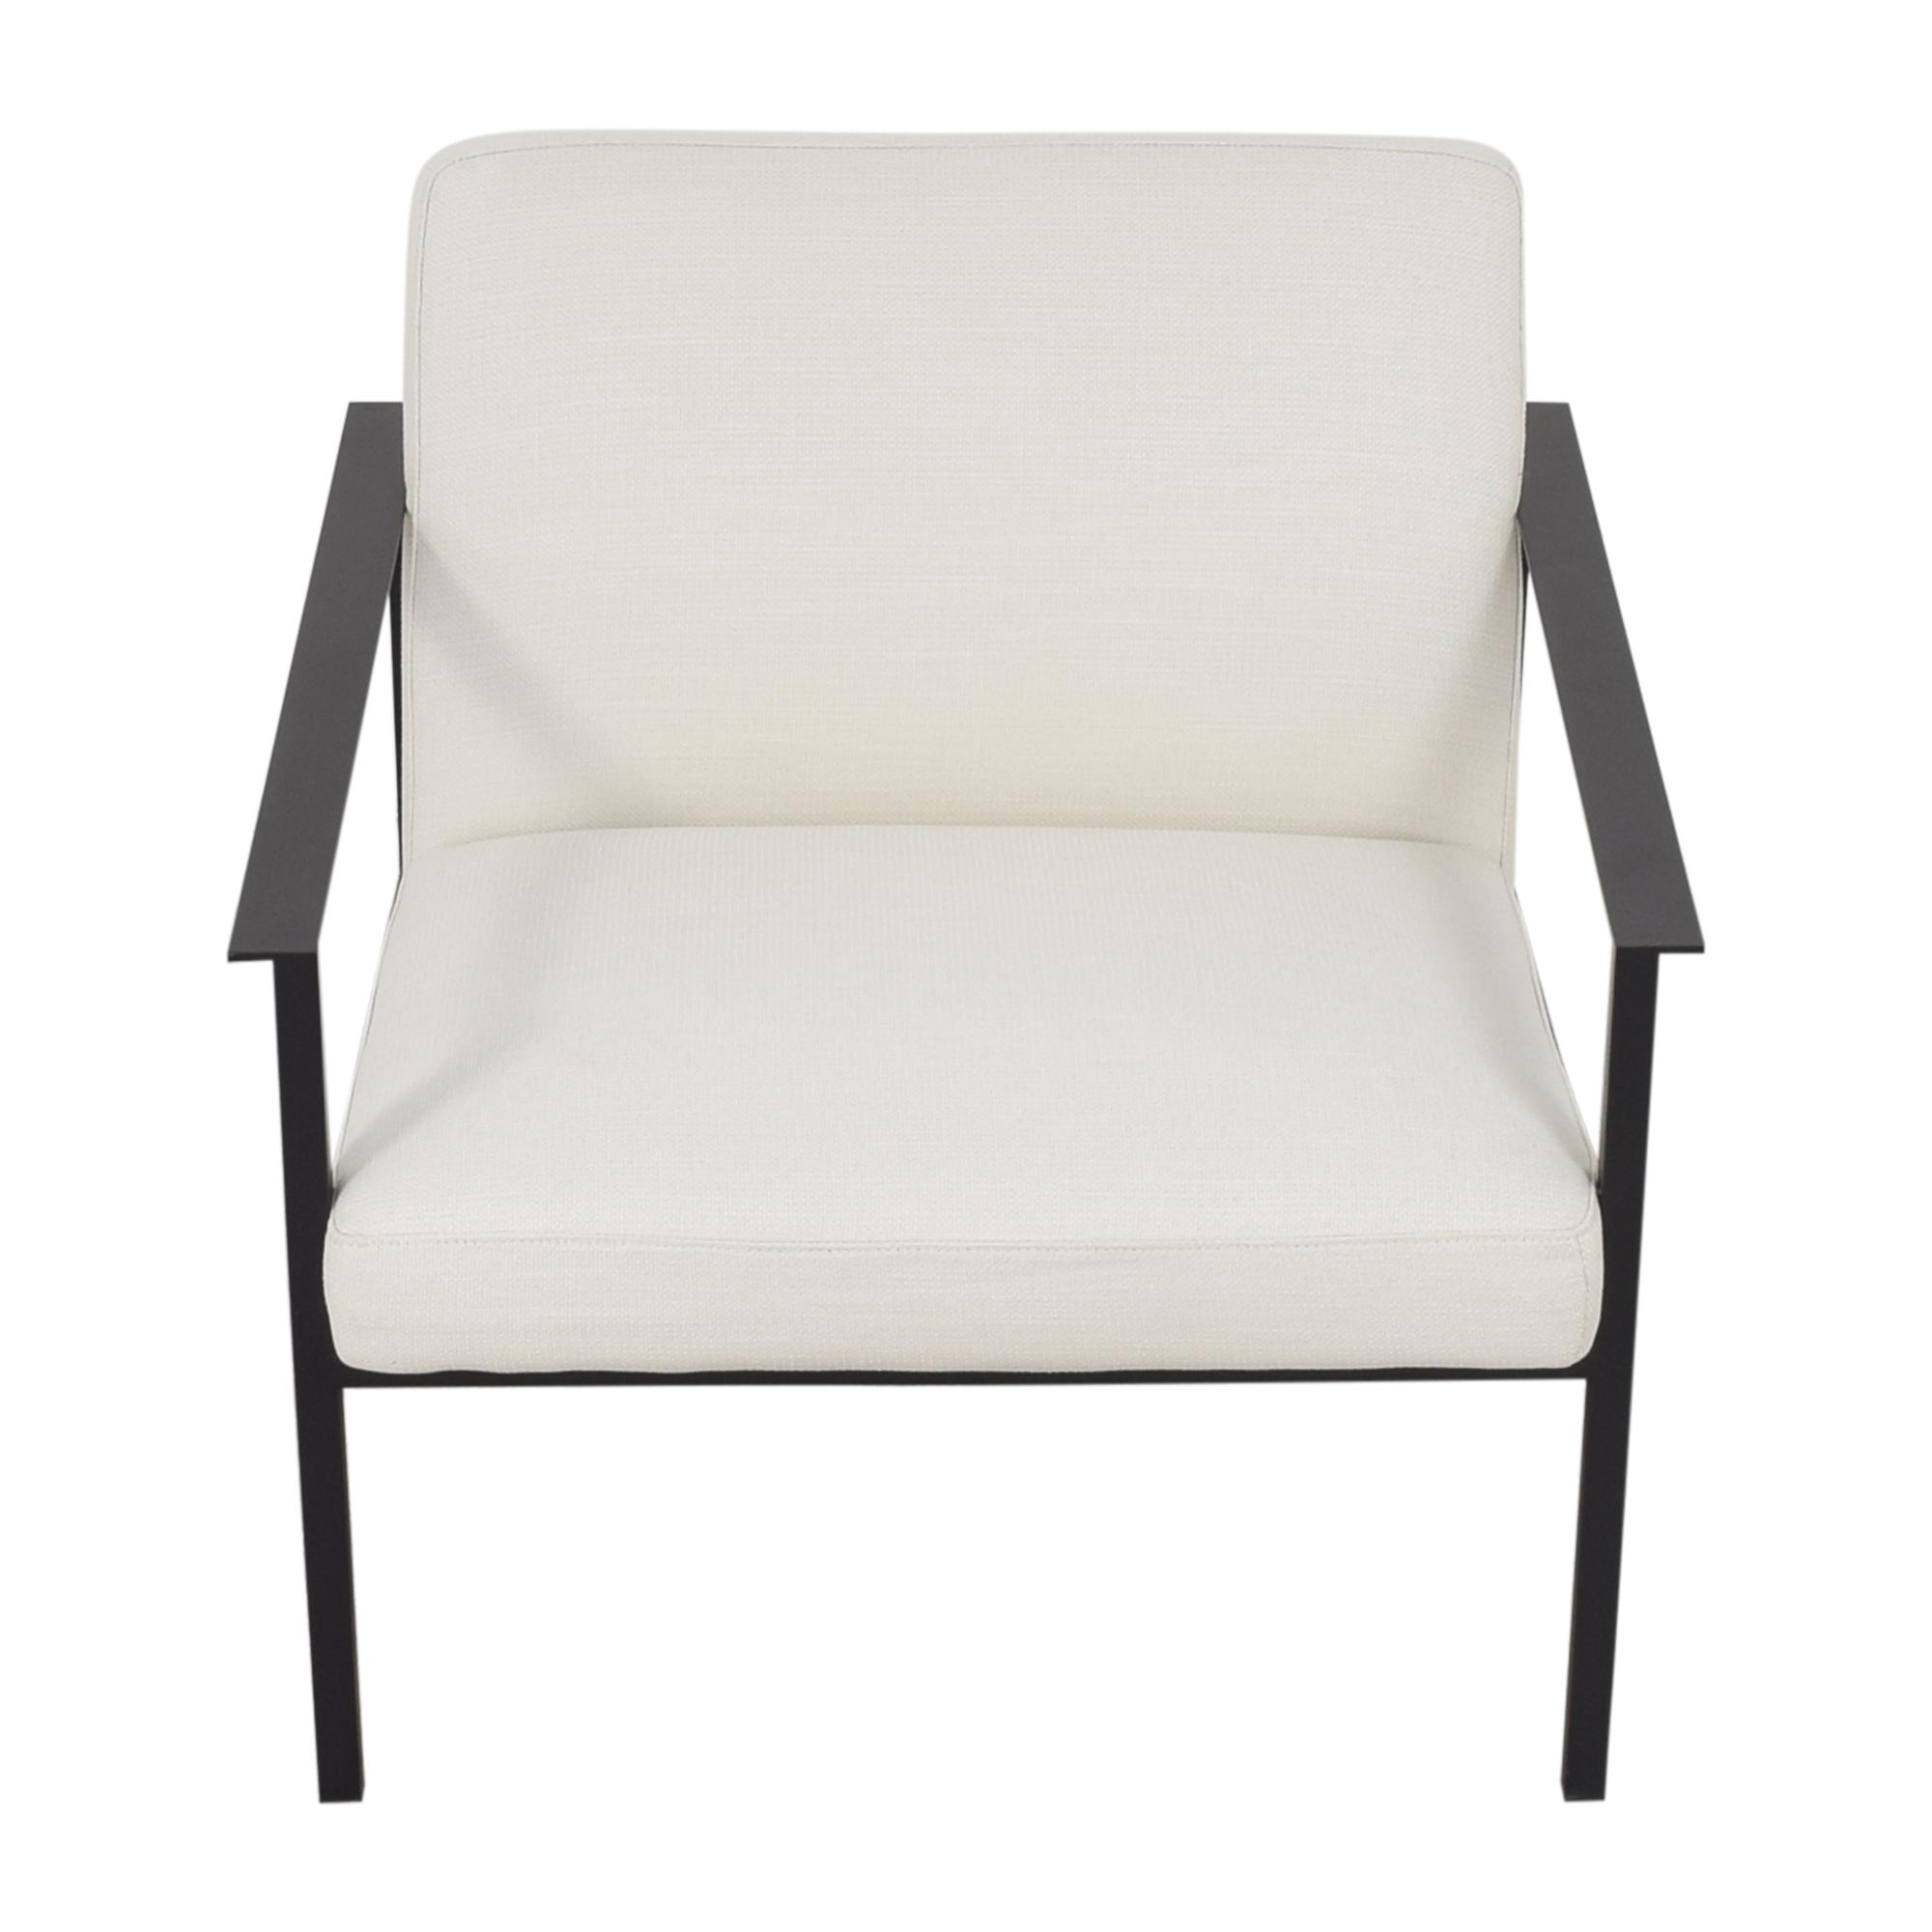 shop CB2 Cue Chair CB2 Accent Chairs